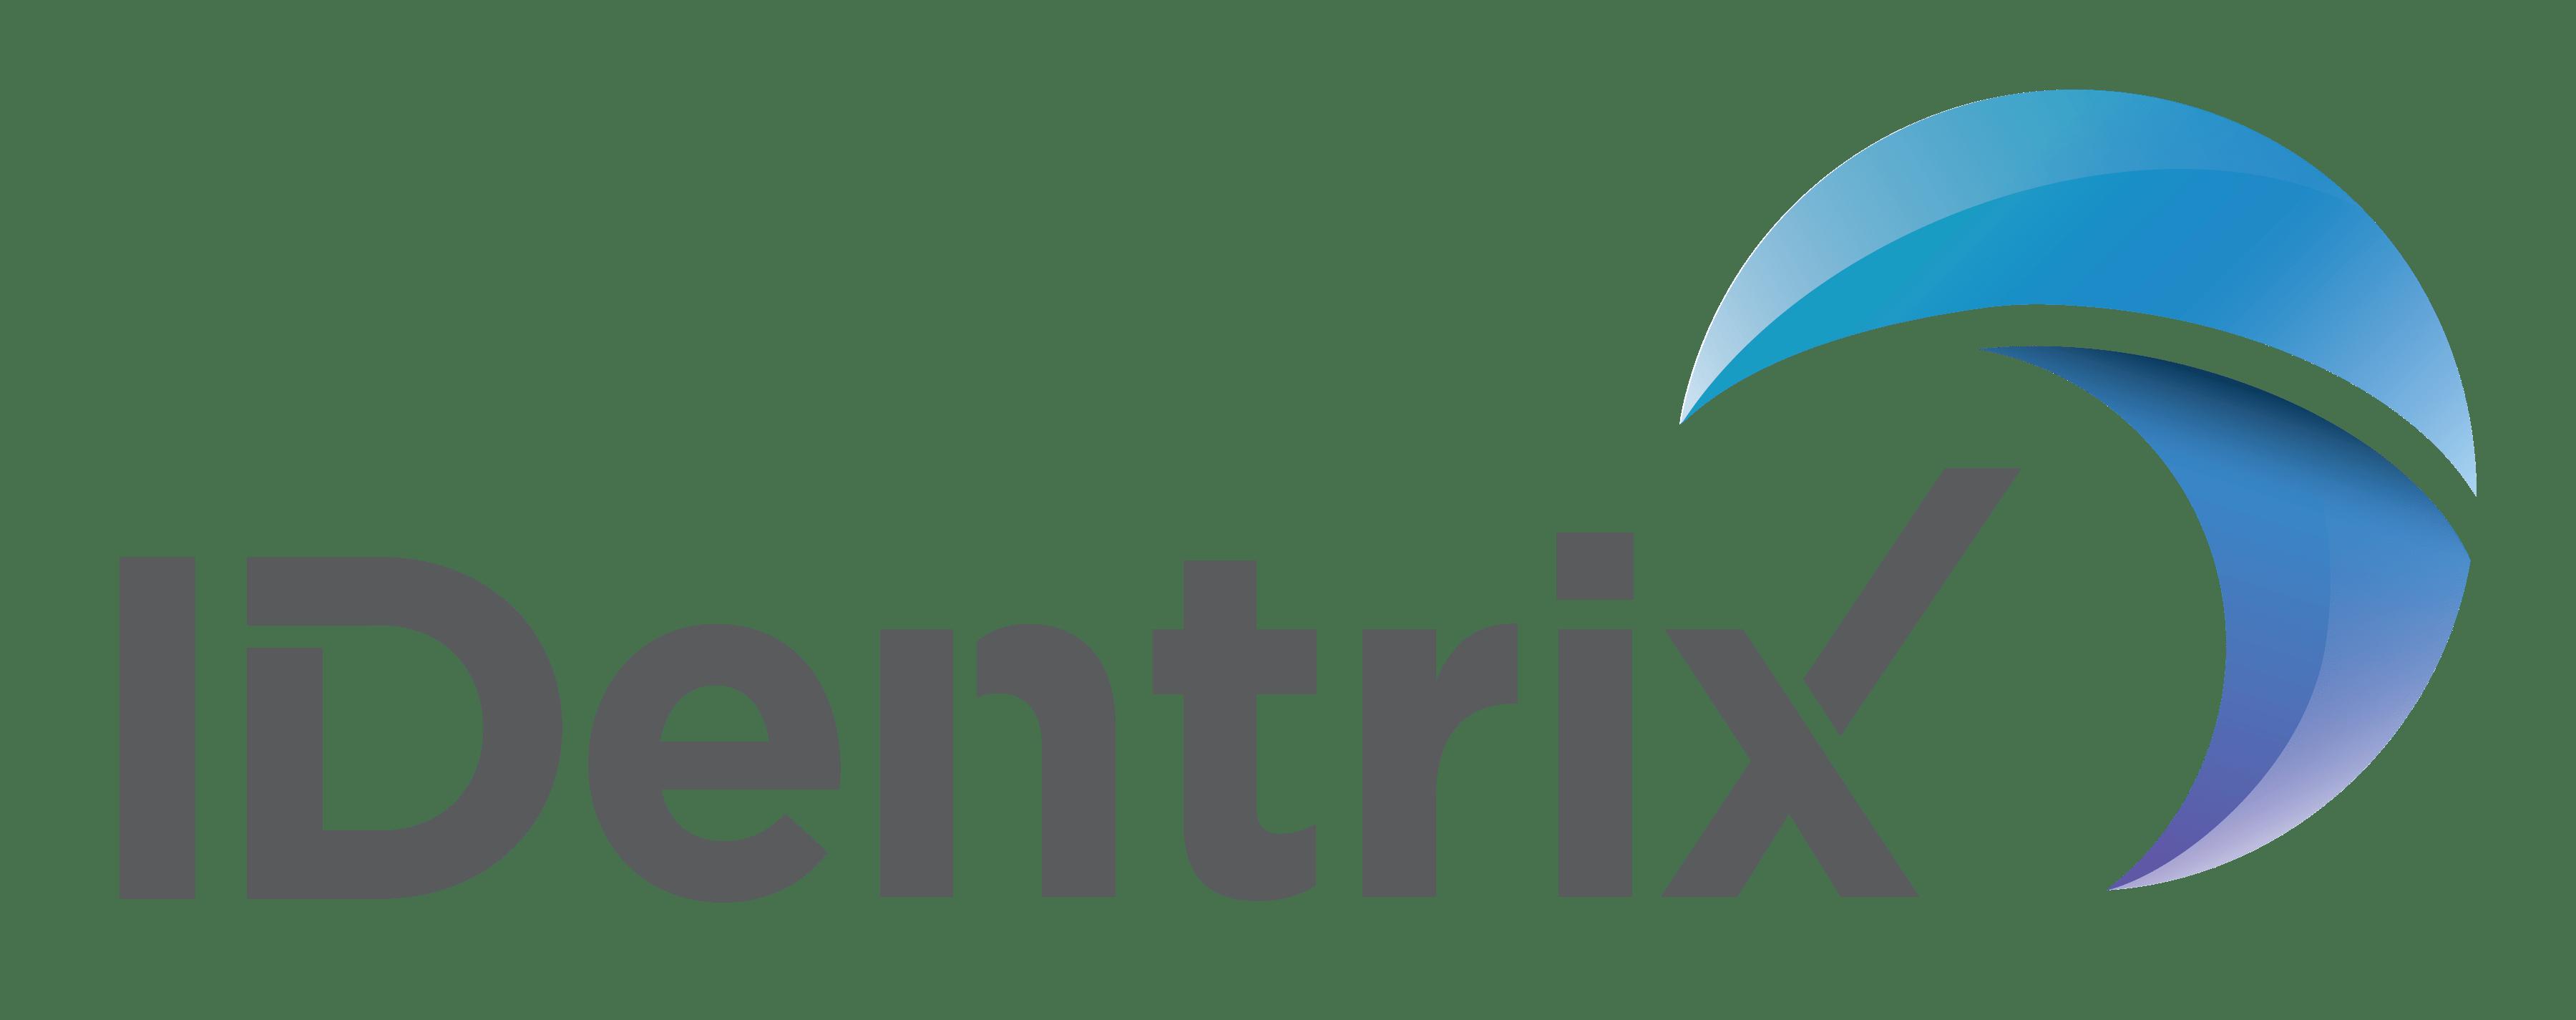 IDentrix